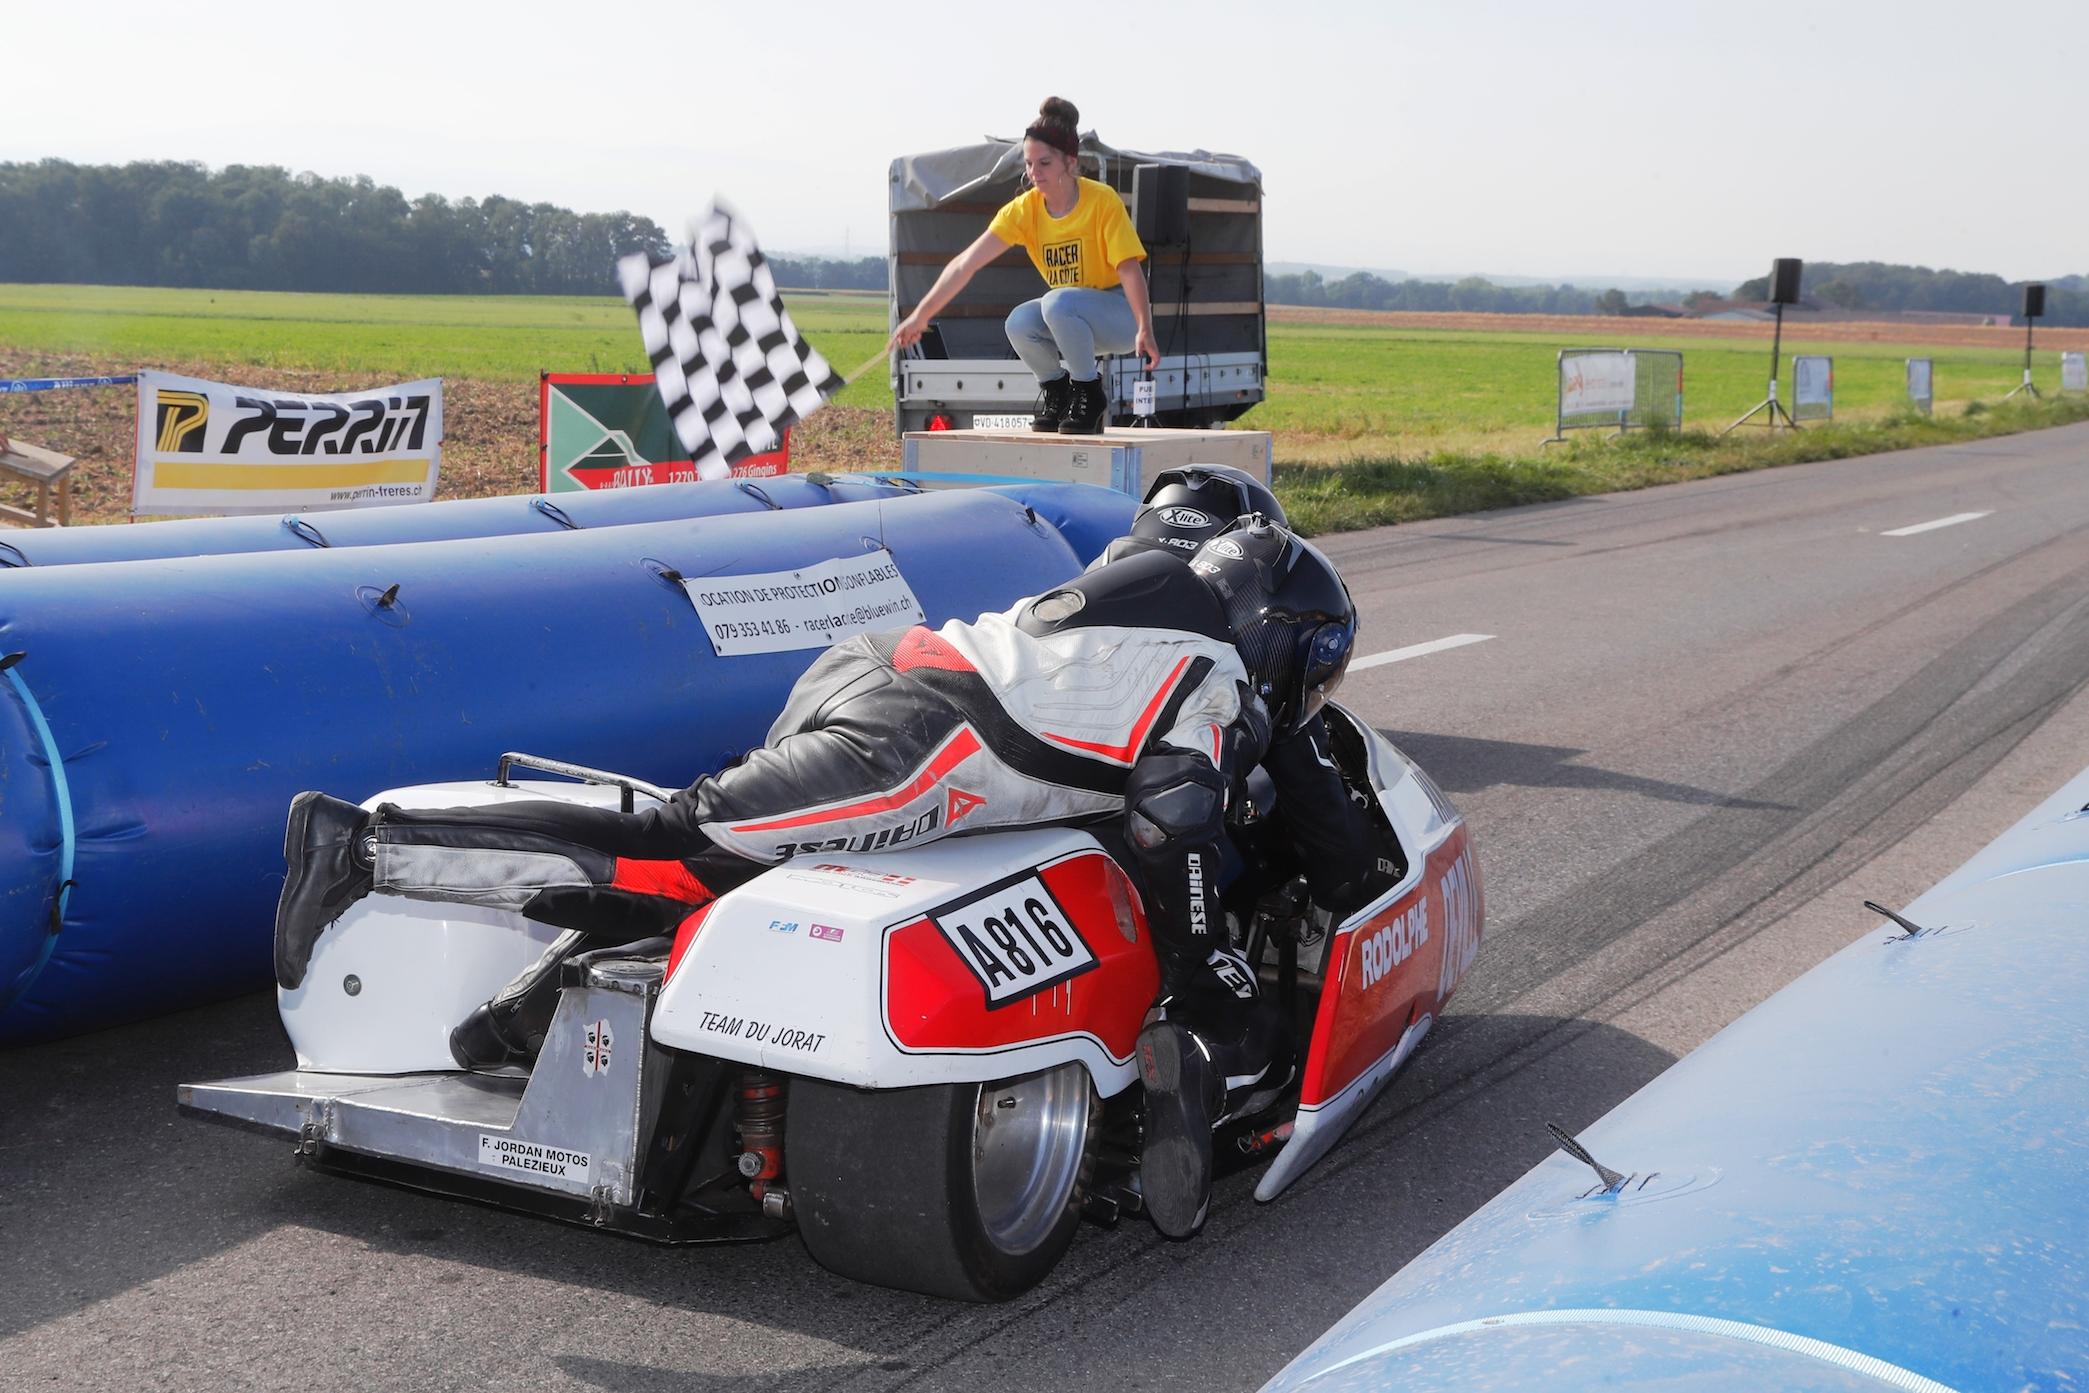 RacerLacote_019small_side_9RL9983